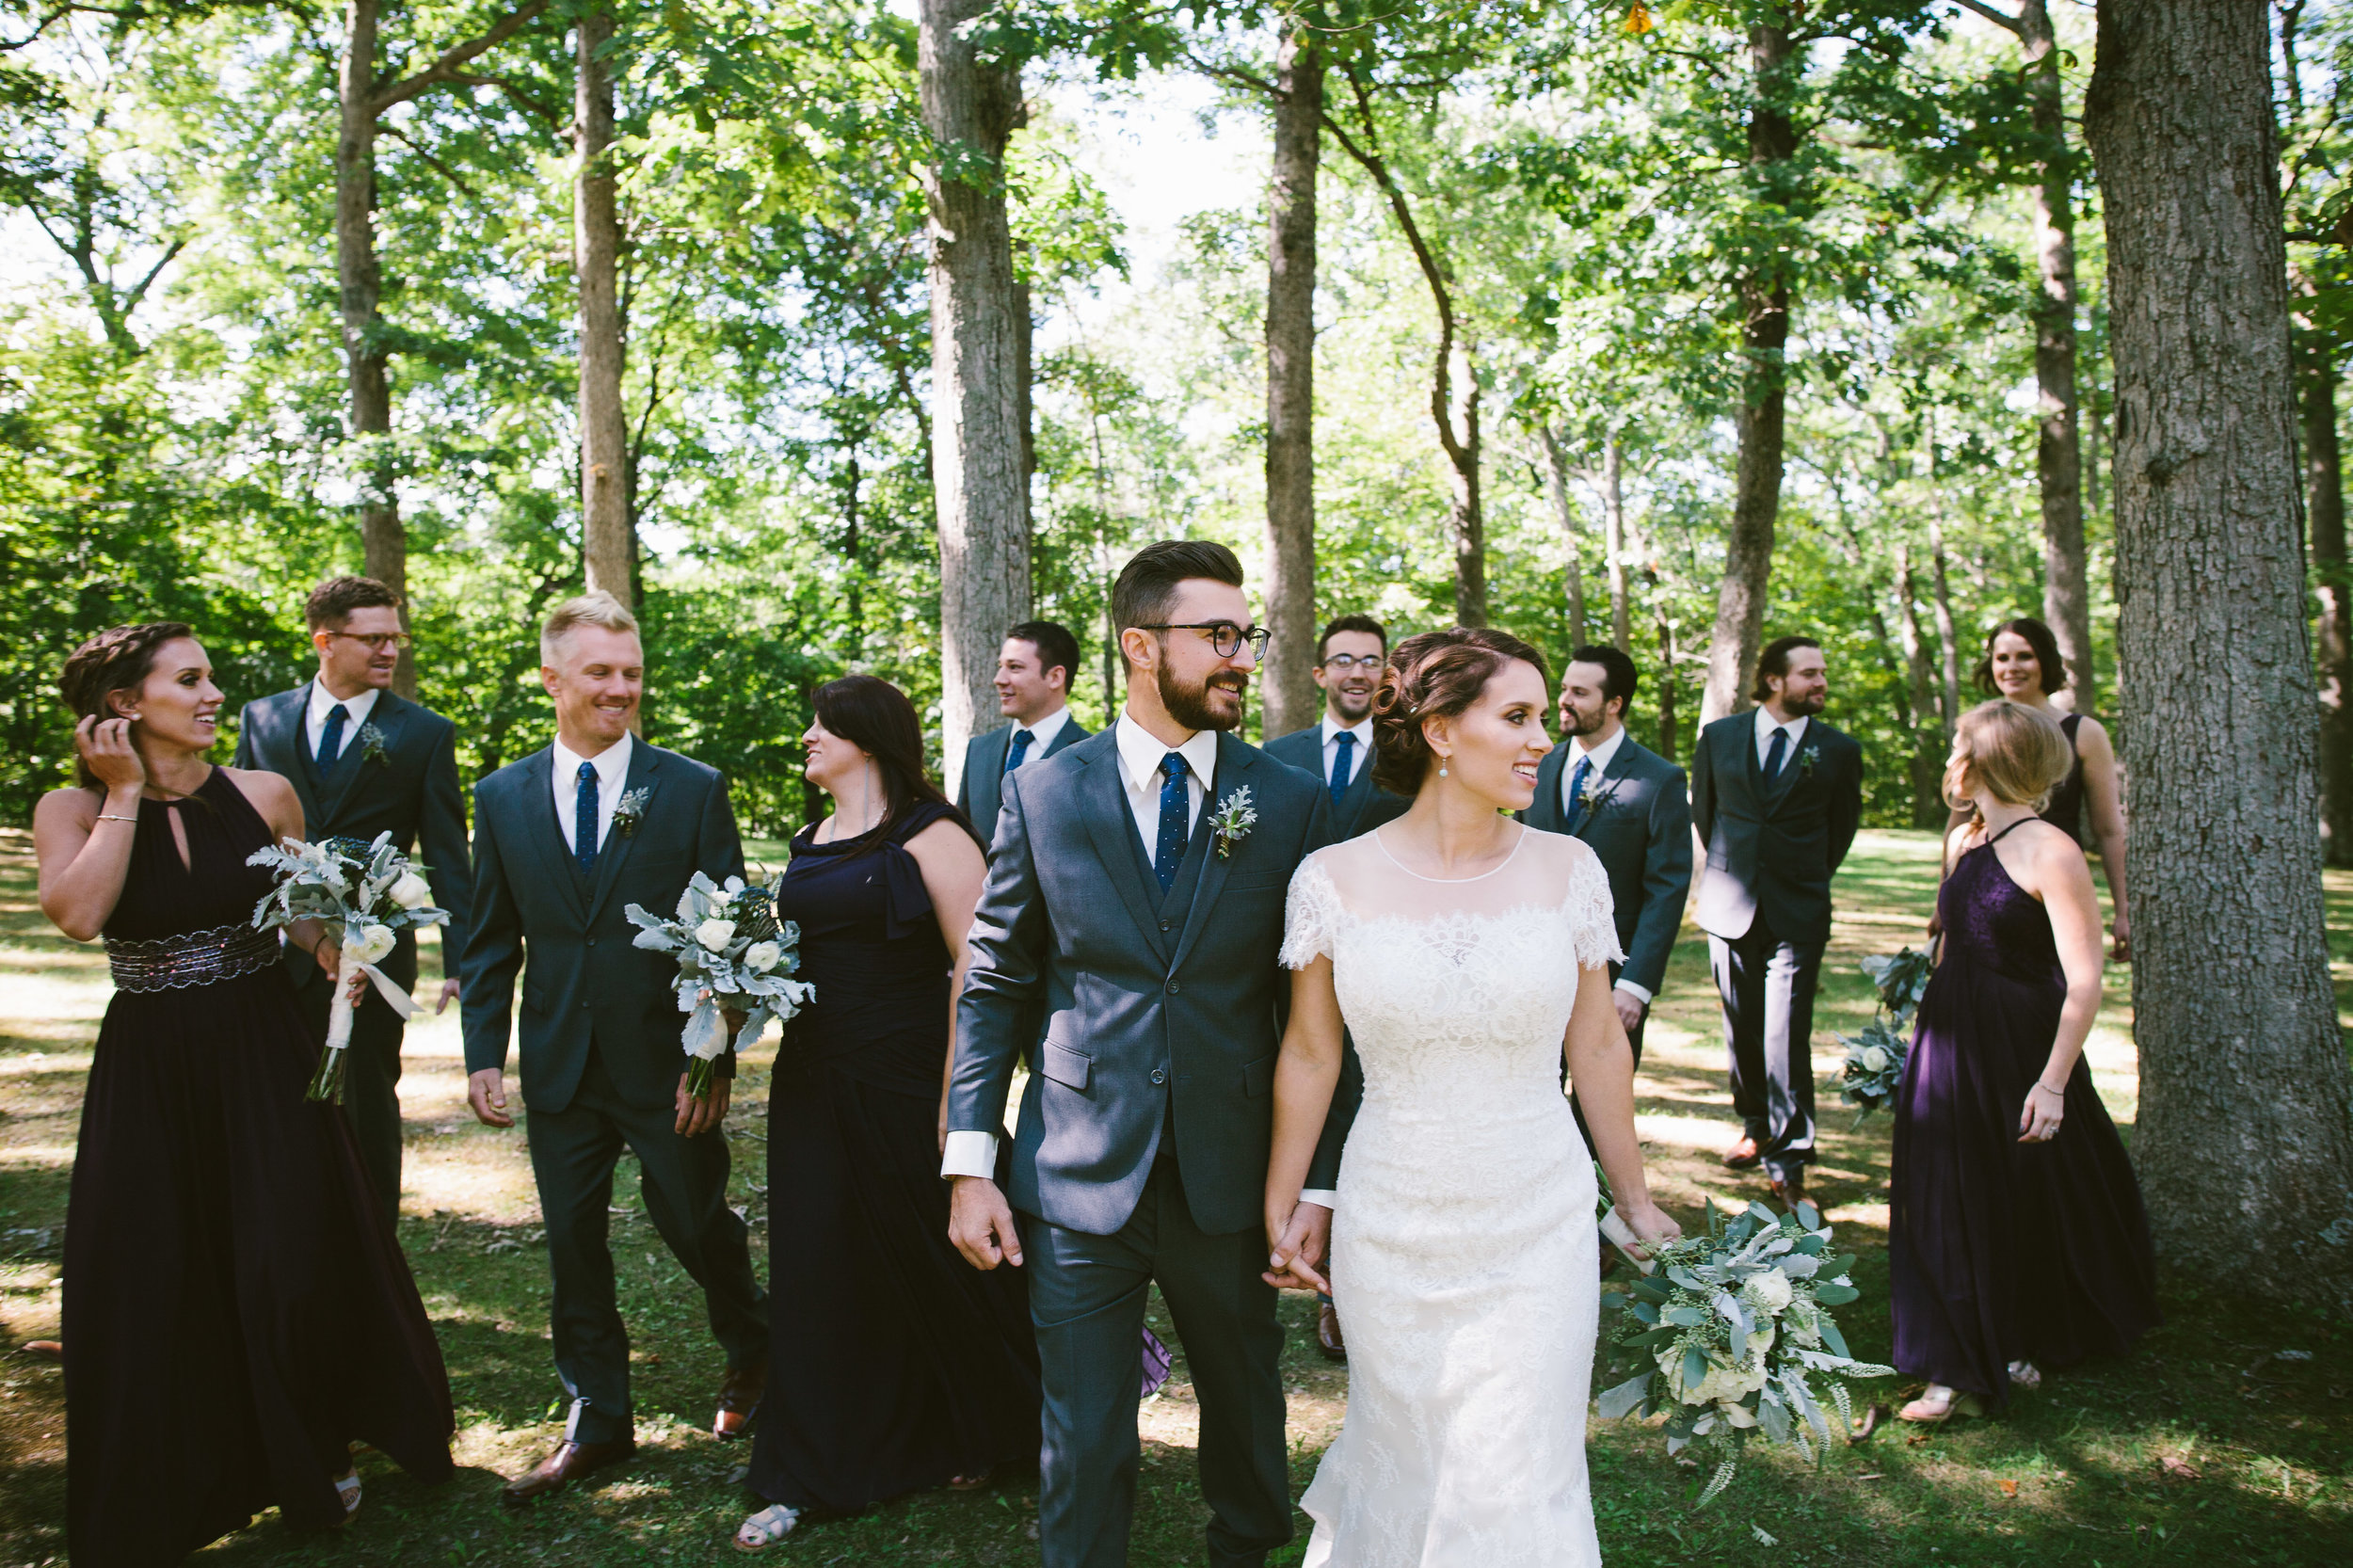 grand_rapids_wedding_rockford_wedding_richard_app_gallery_wedding_grand_rapids_wedding_photographer_summer_wedding_wabasis_lake_park_wedding_rustic_wedding-25.jpg